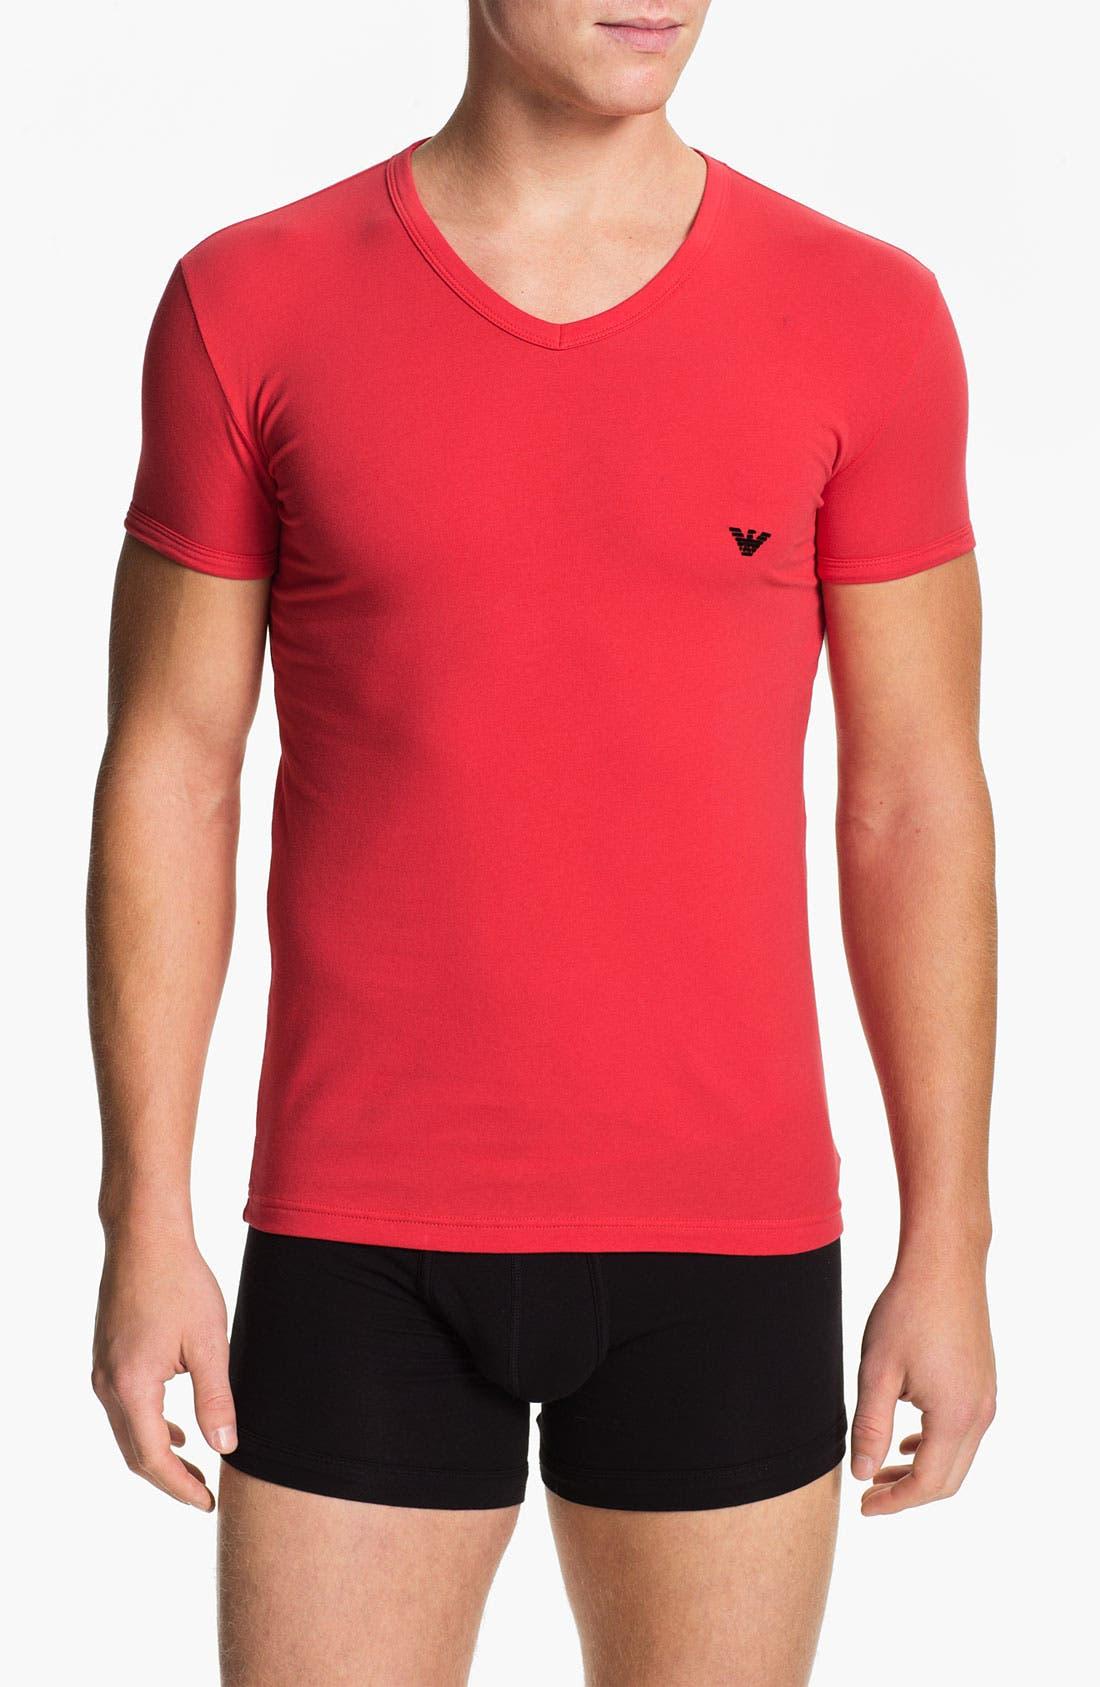 Alternate Image 1 Selected - Emporio Armani V-Neck Stretch Cotton T-Shirt